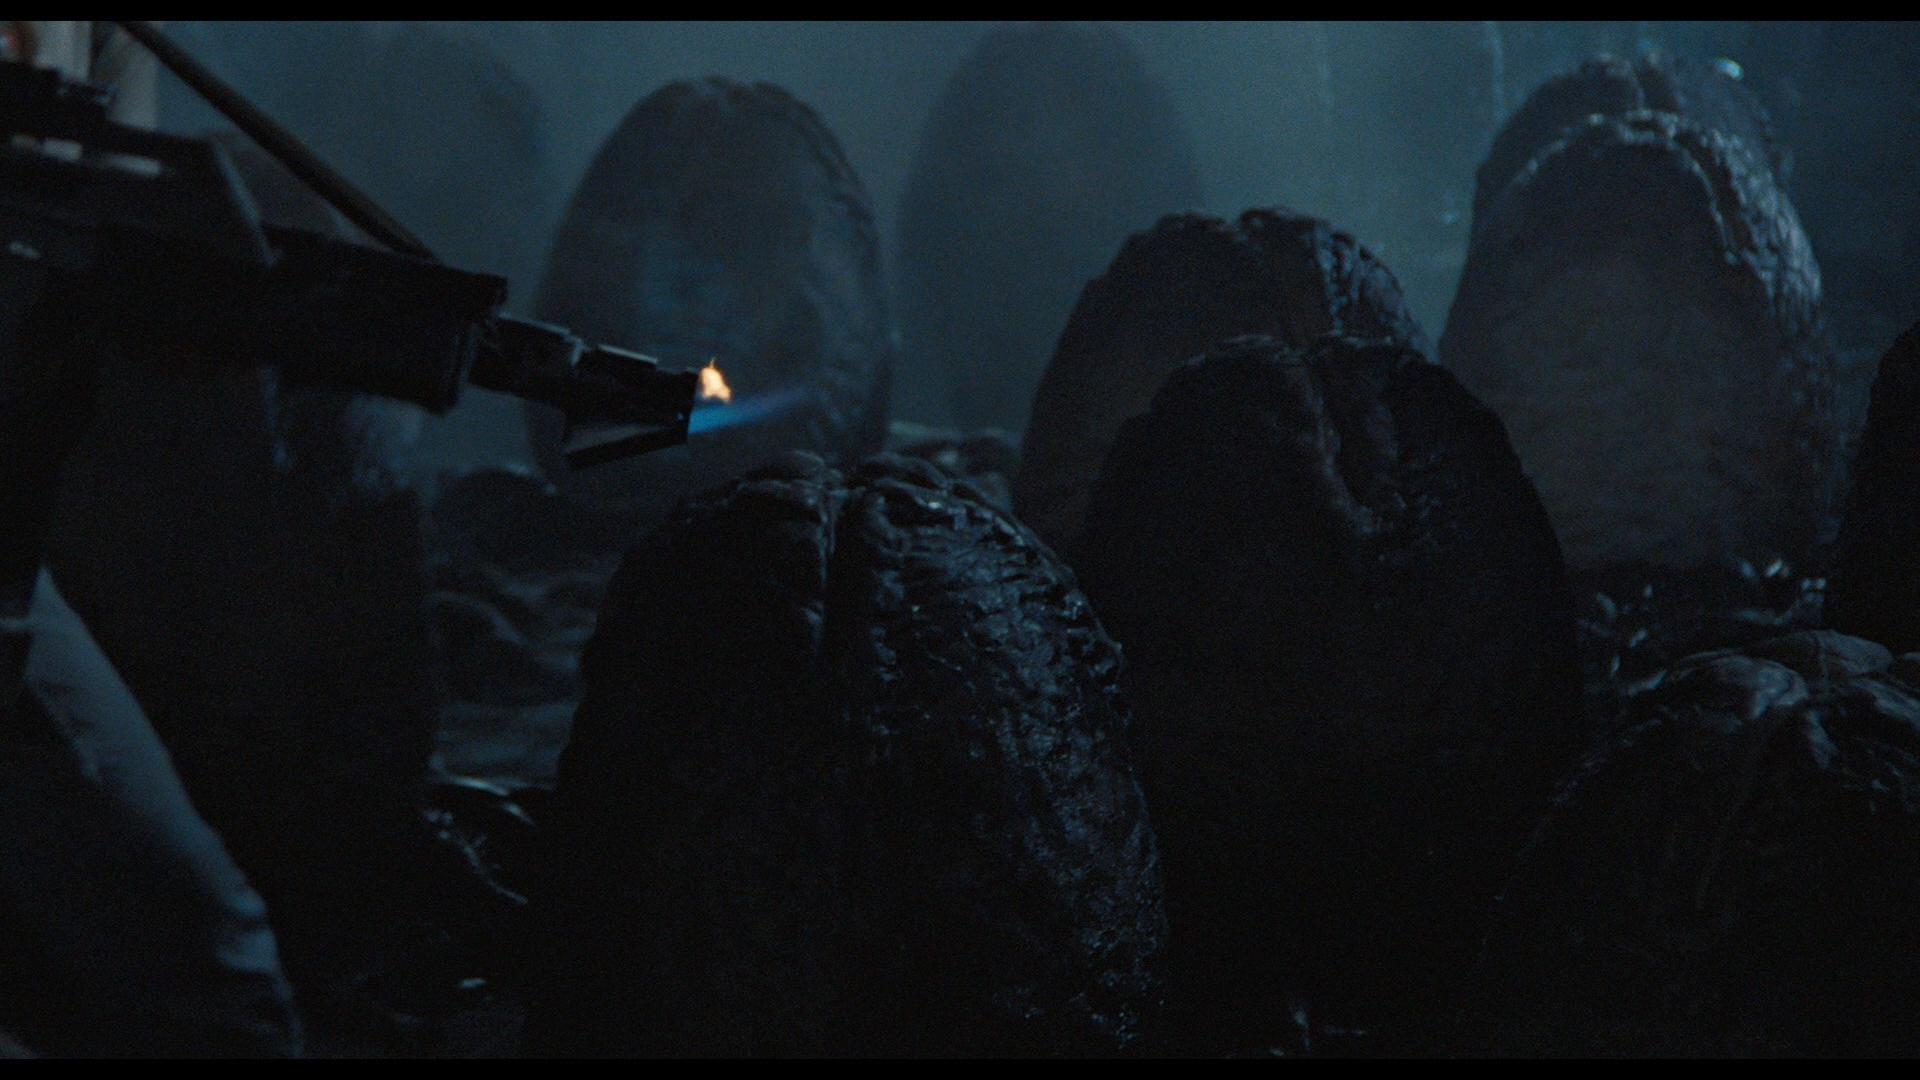 ALIENS (1986) - Xenomorph Egg - Image 14 of 14